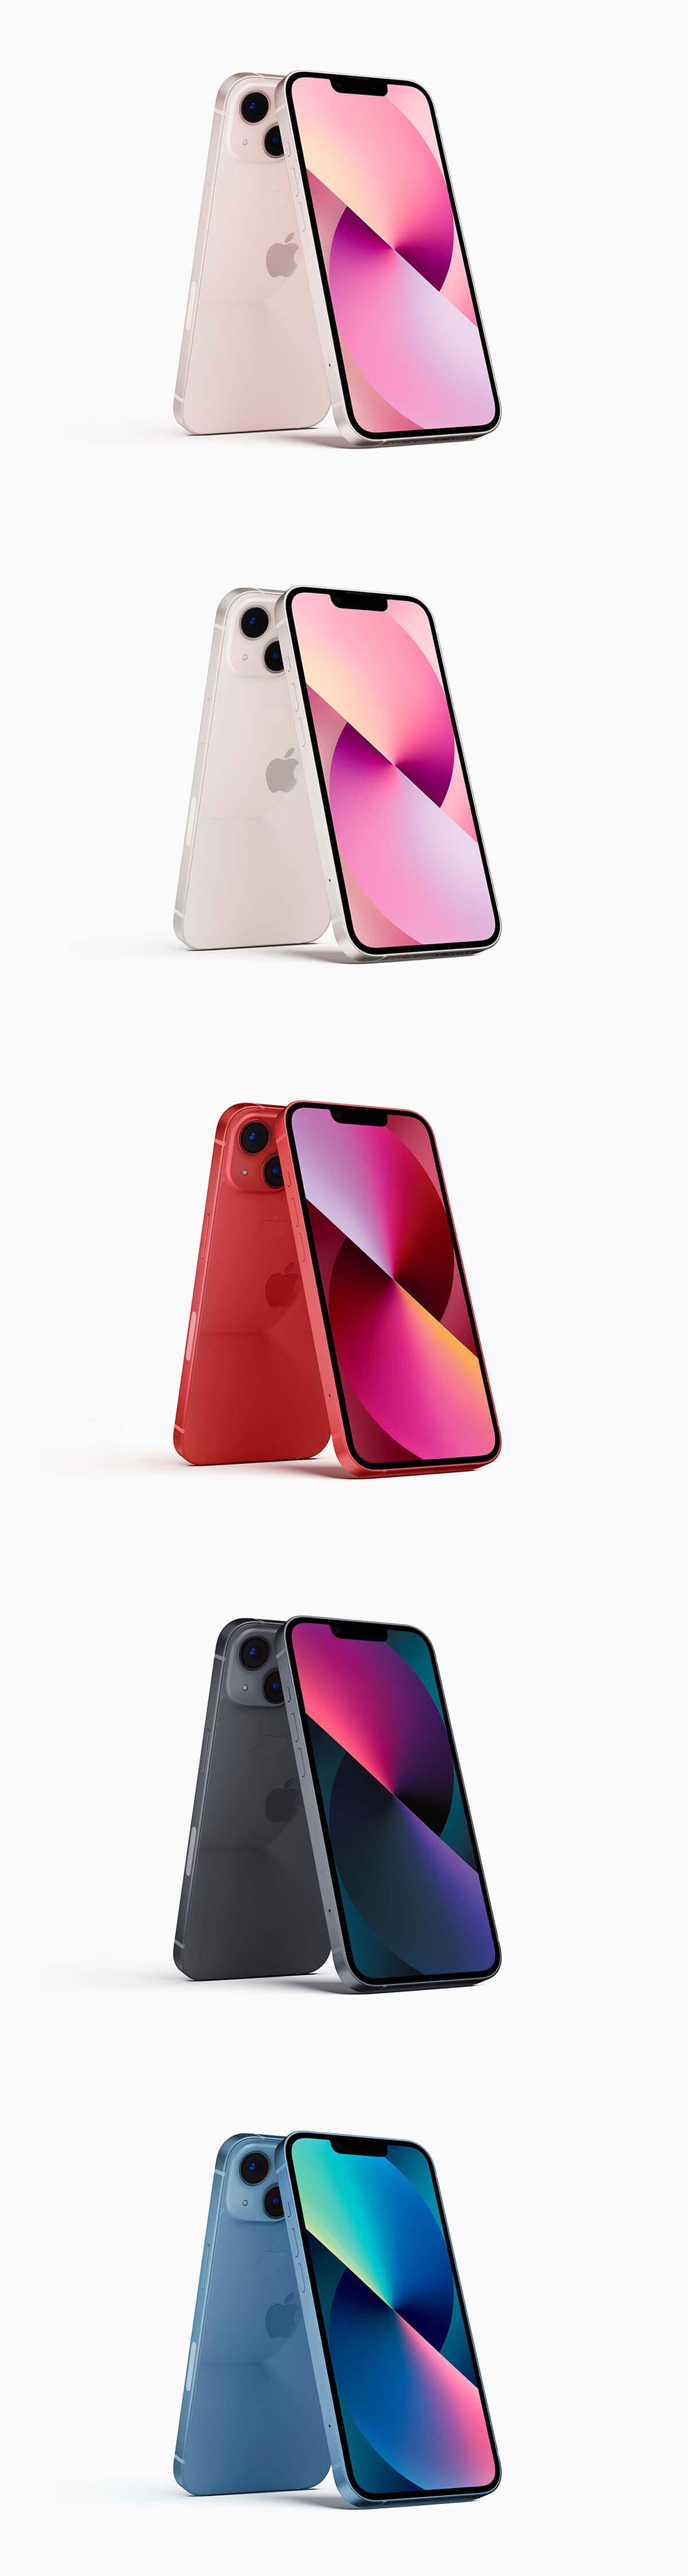 iPhone 13 Mockup PSD